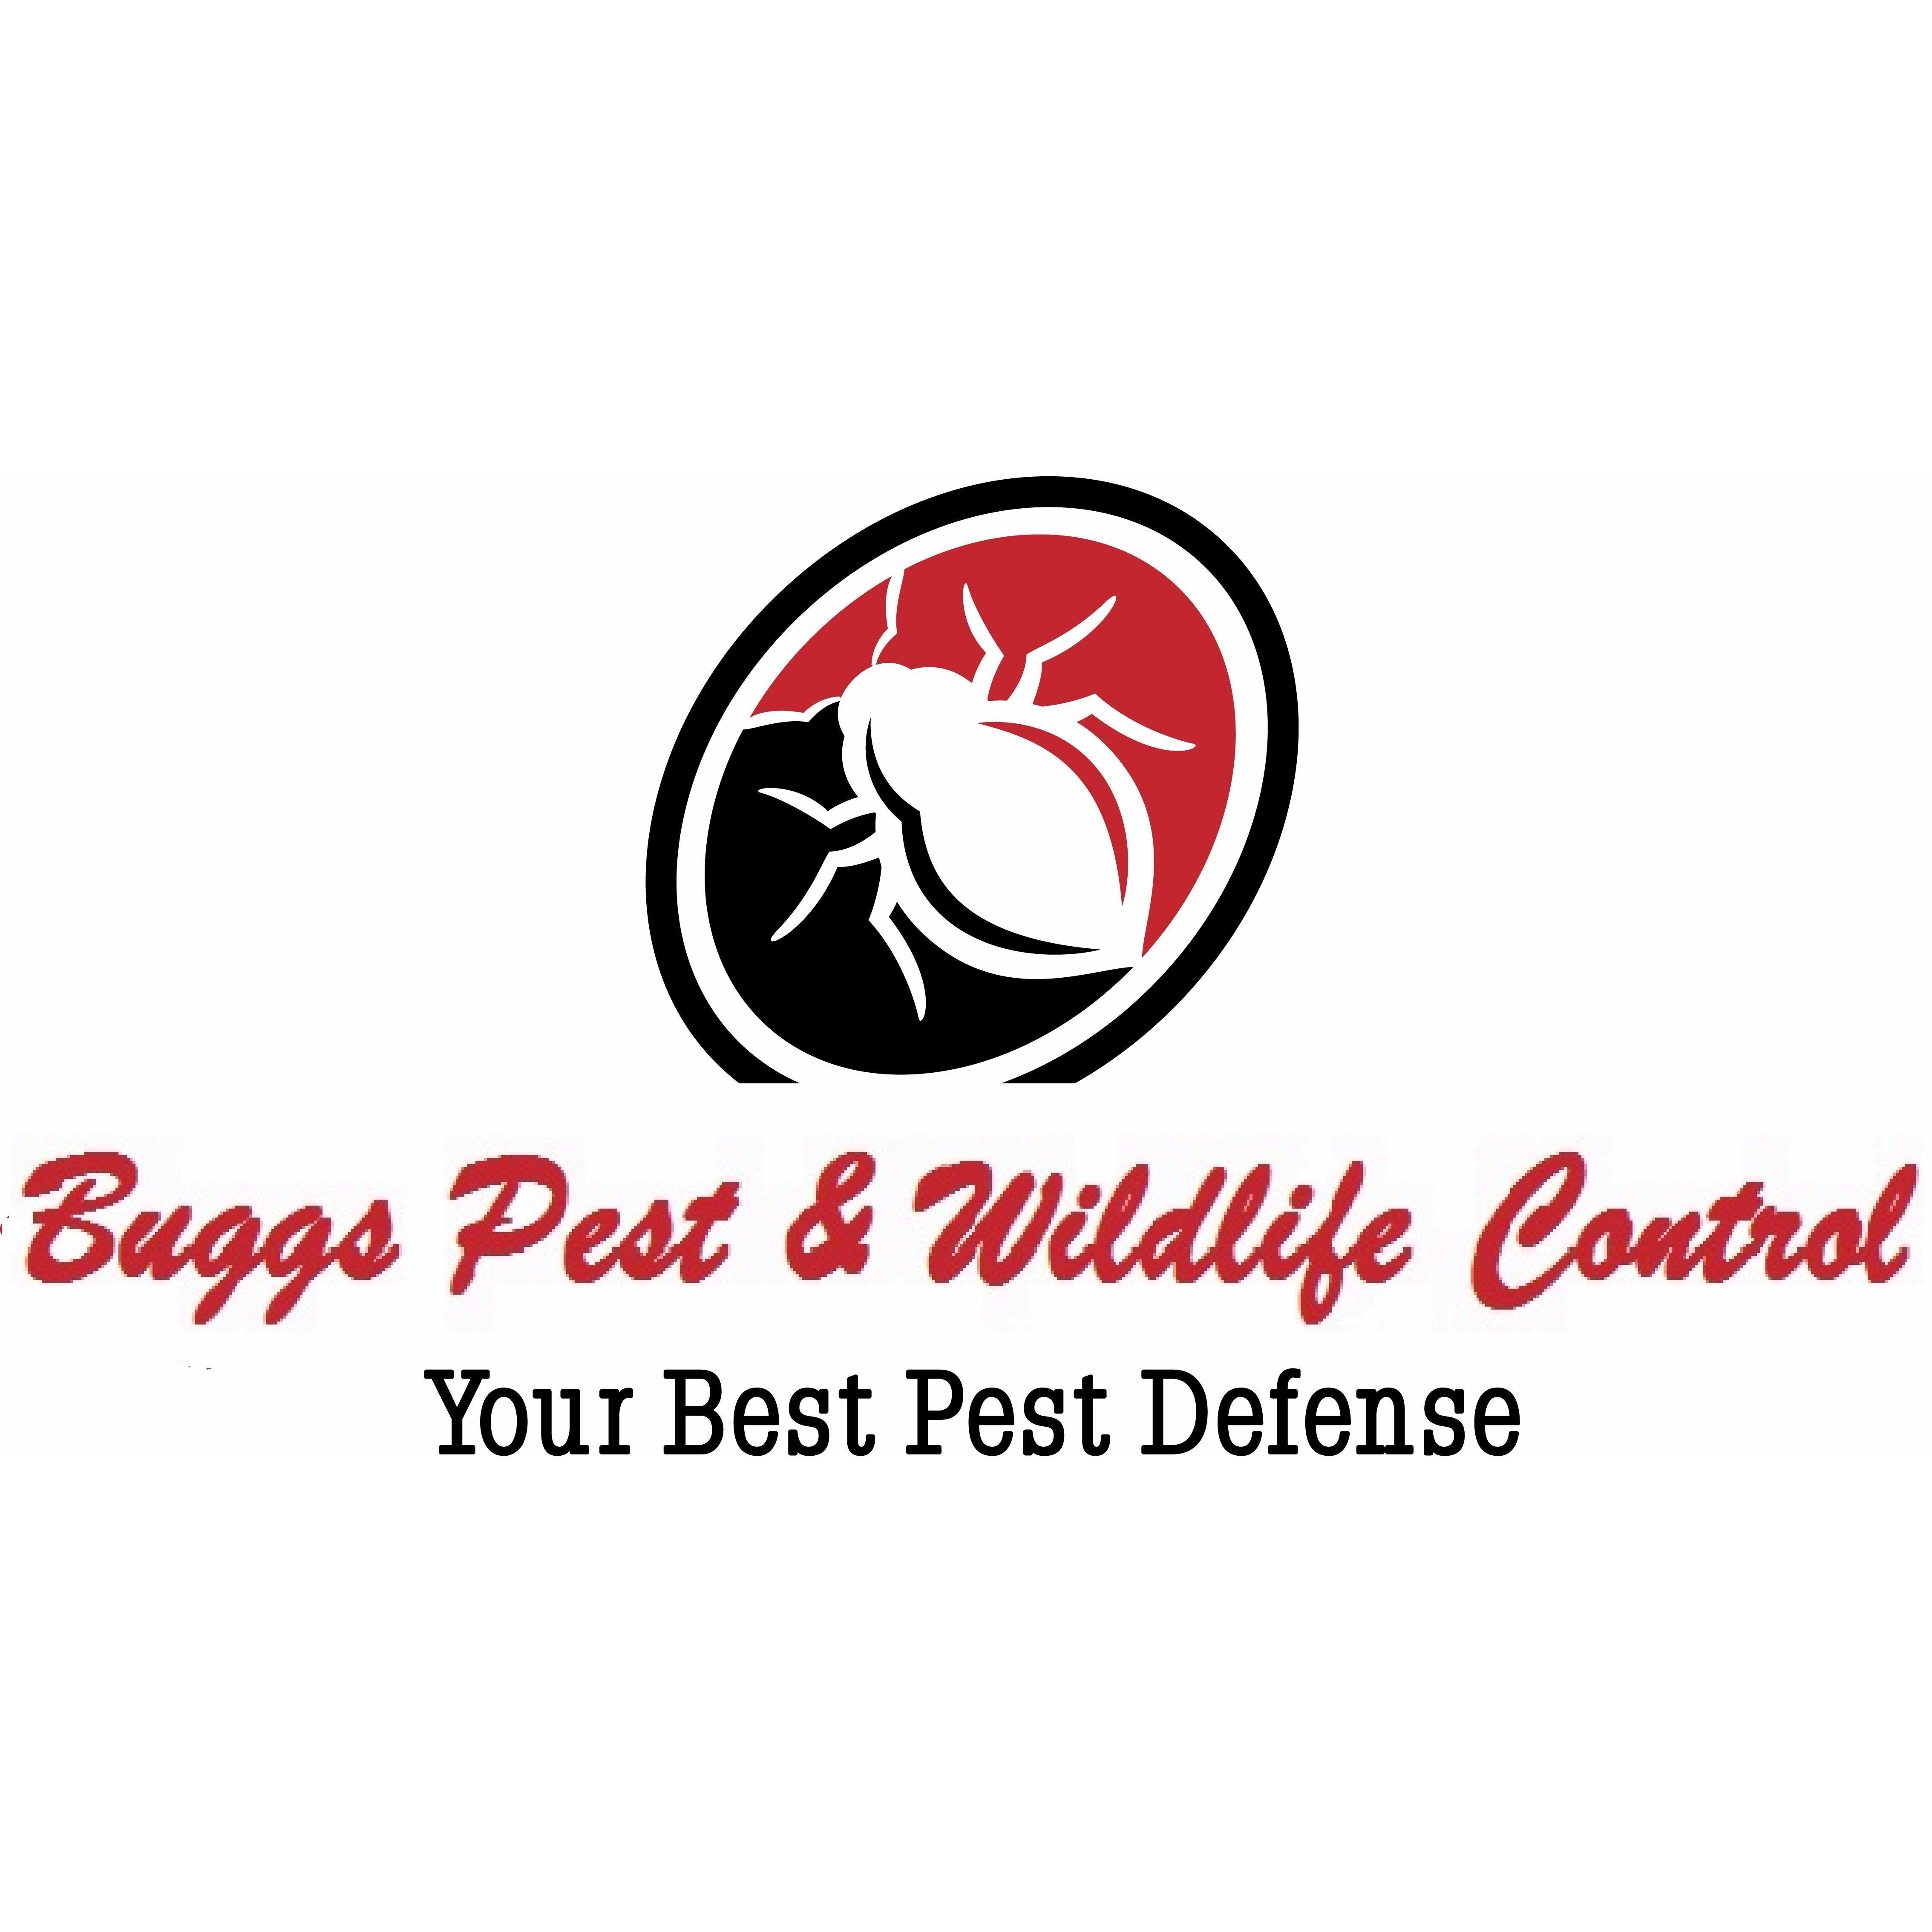 Buggs Pest & Wildlife Control